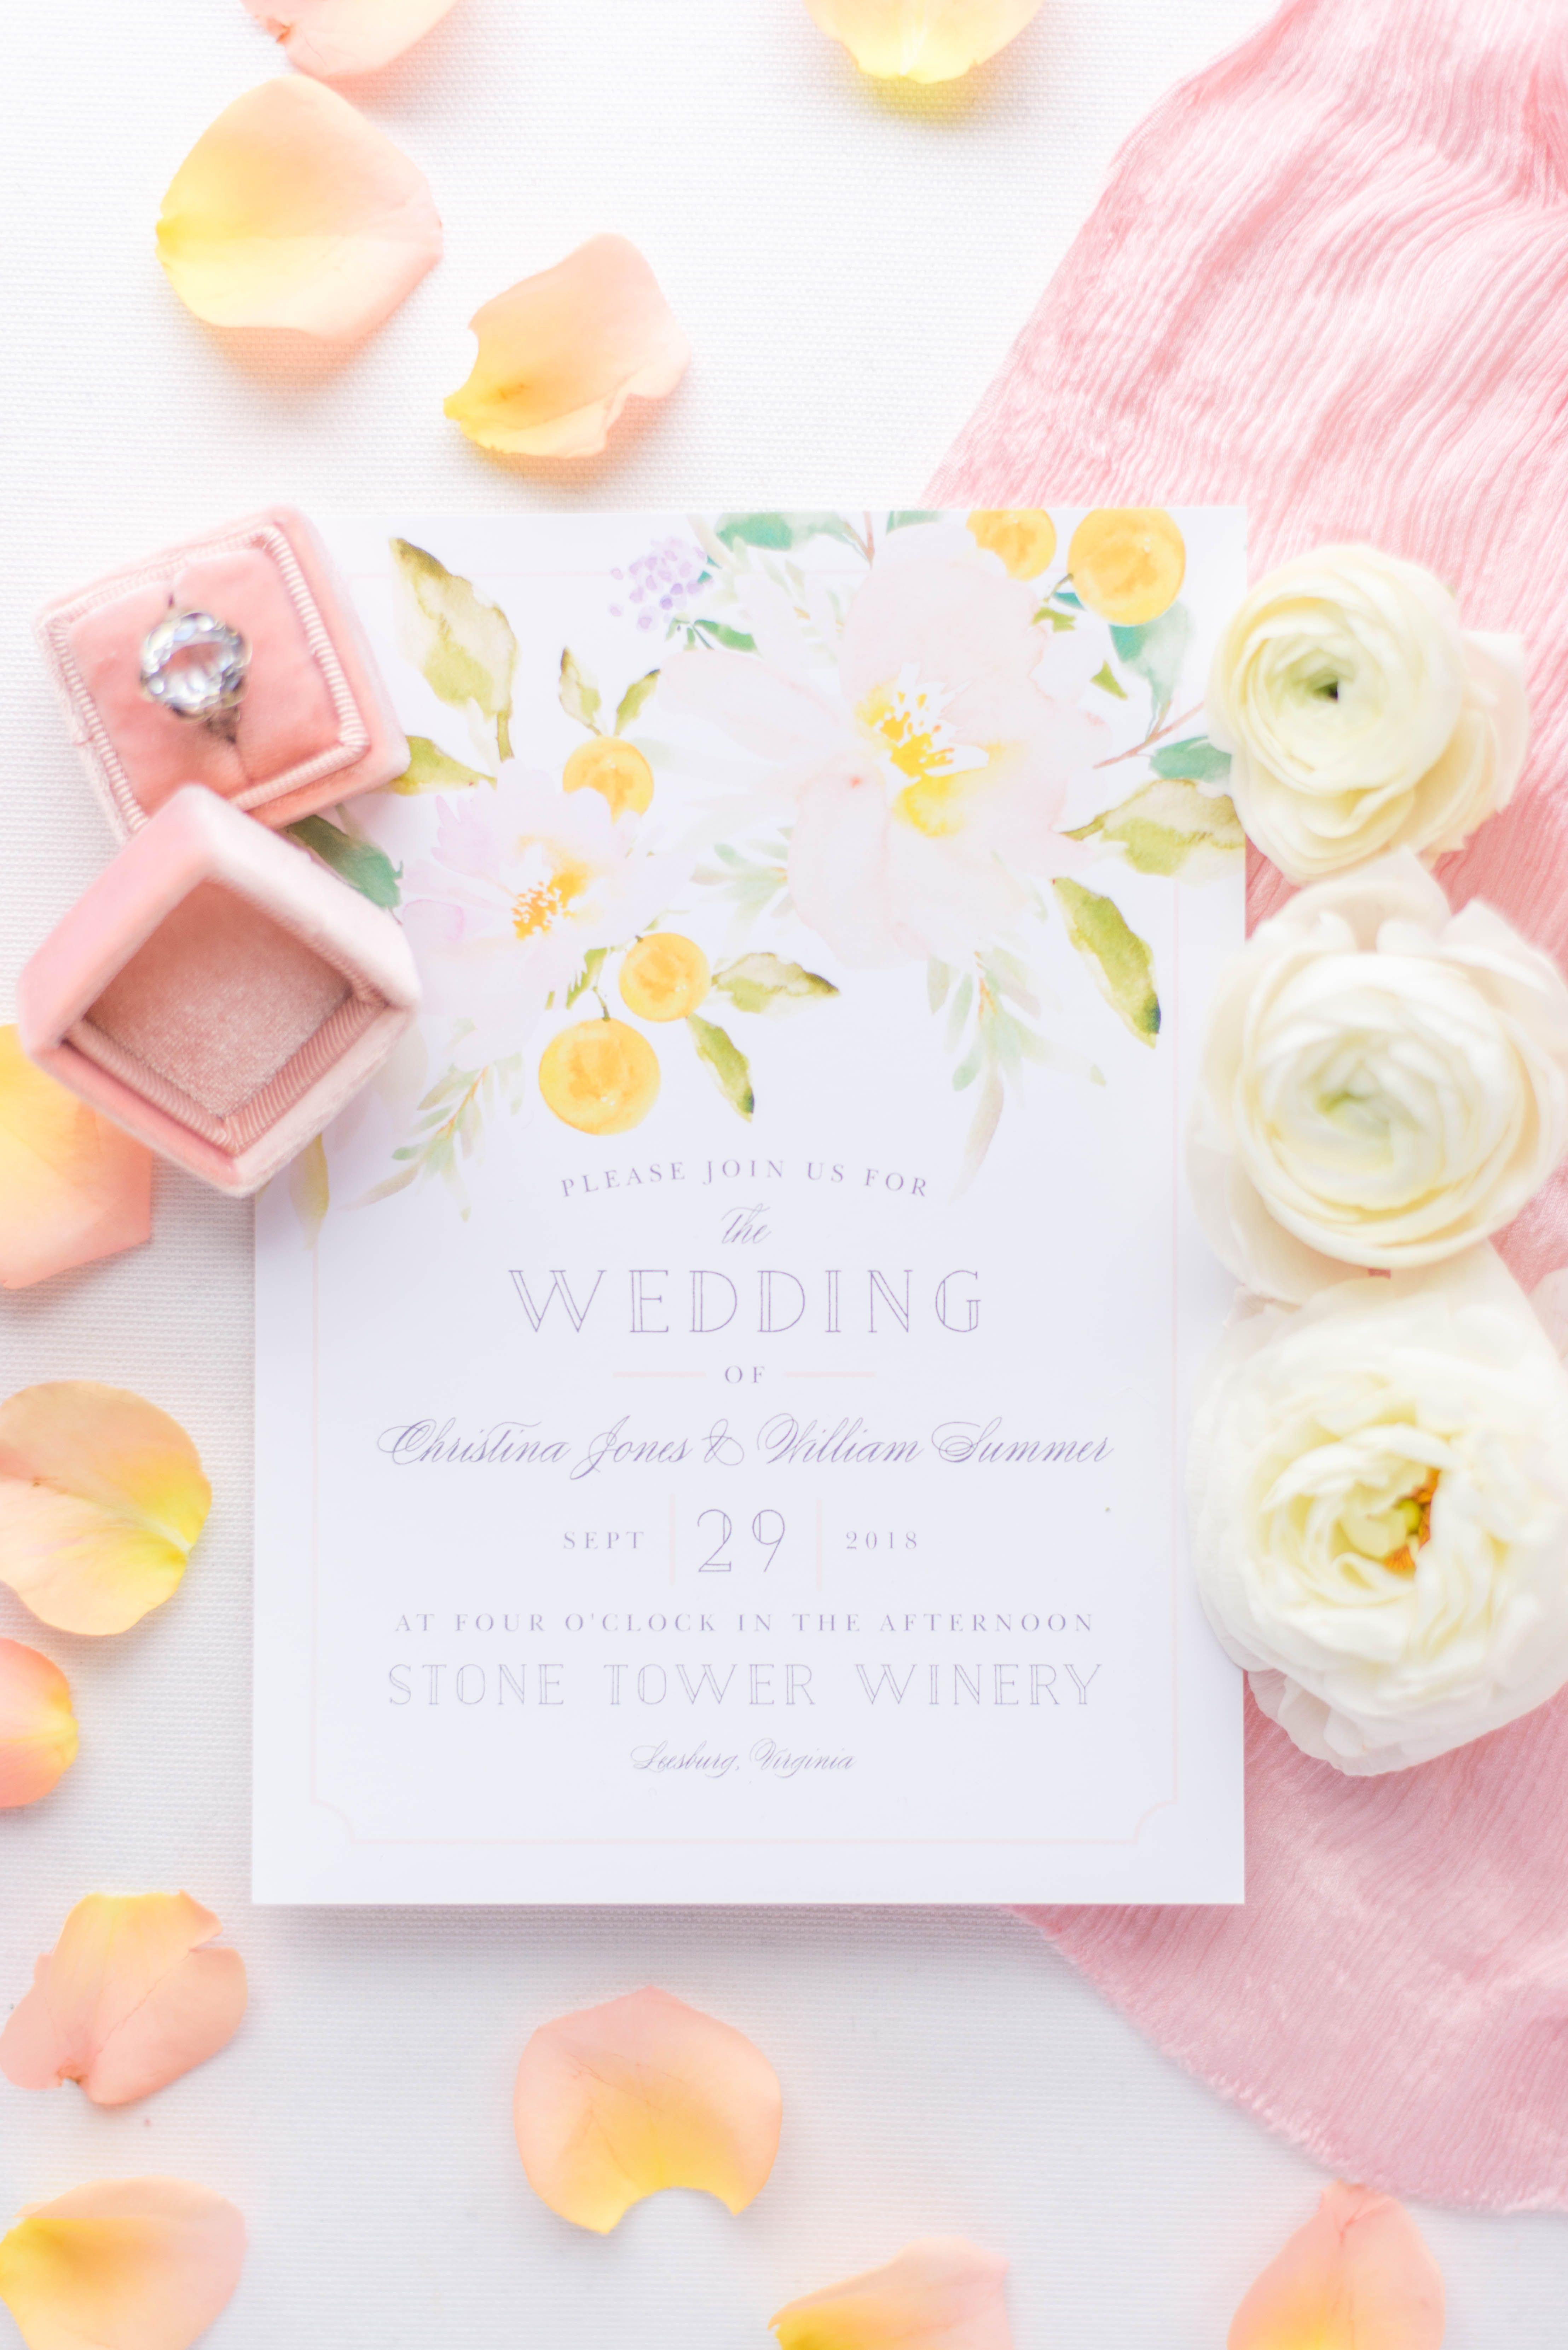 Melodious Melanie Wedding Invitations | Wedding, Weddings and Photo ...